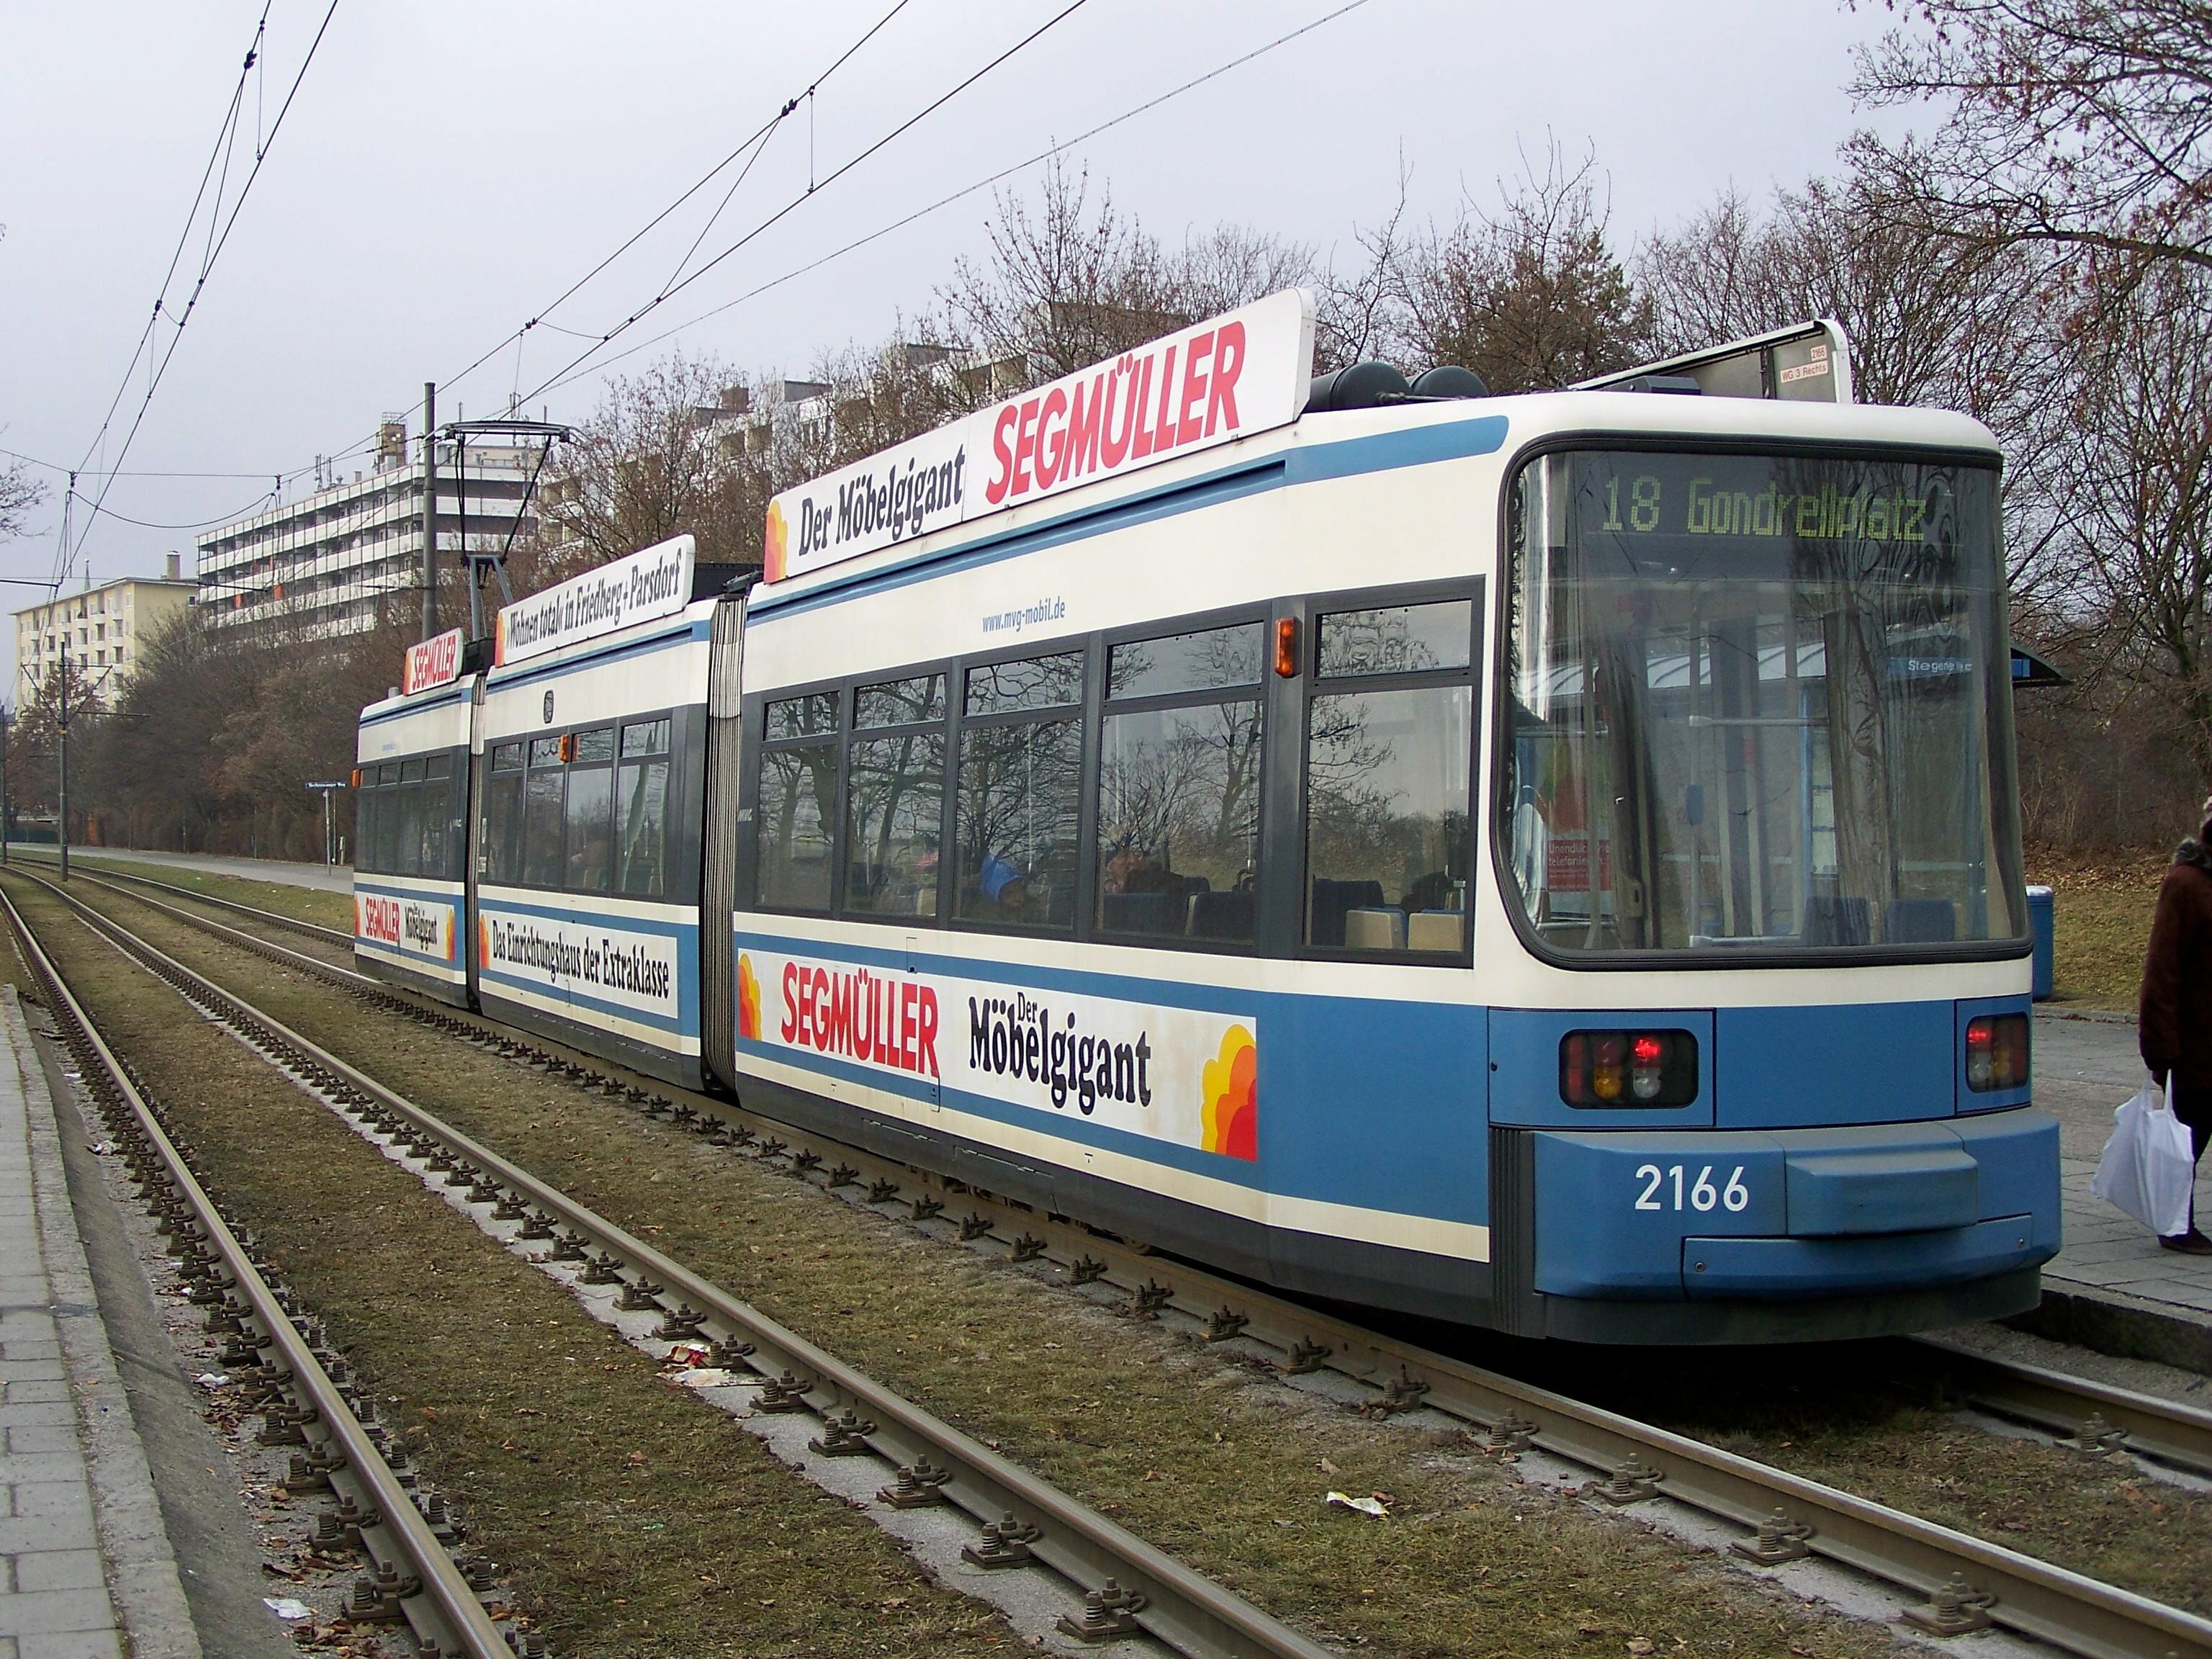 File Linie 18 Stegener Weg Richtung Gondrellplatz Jpg Wikimedia